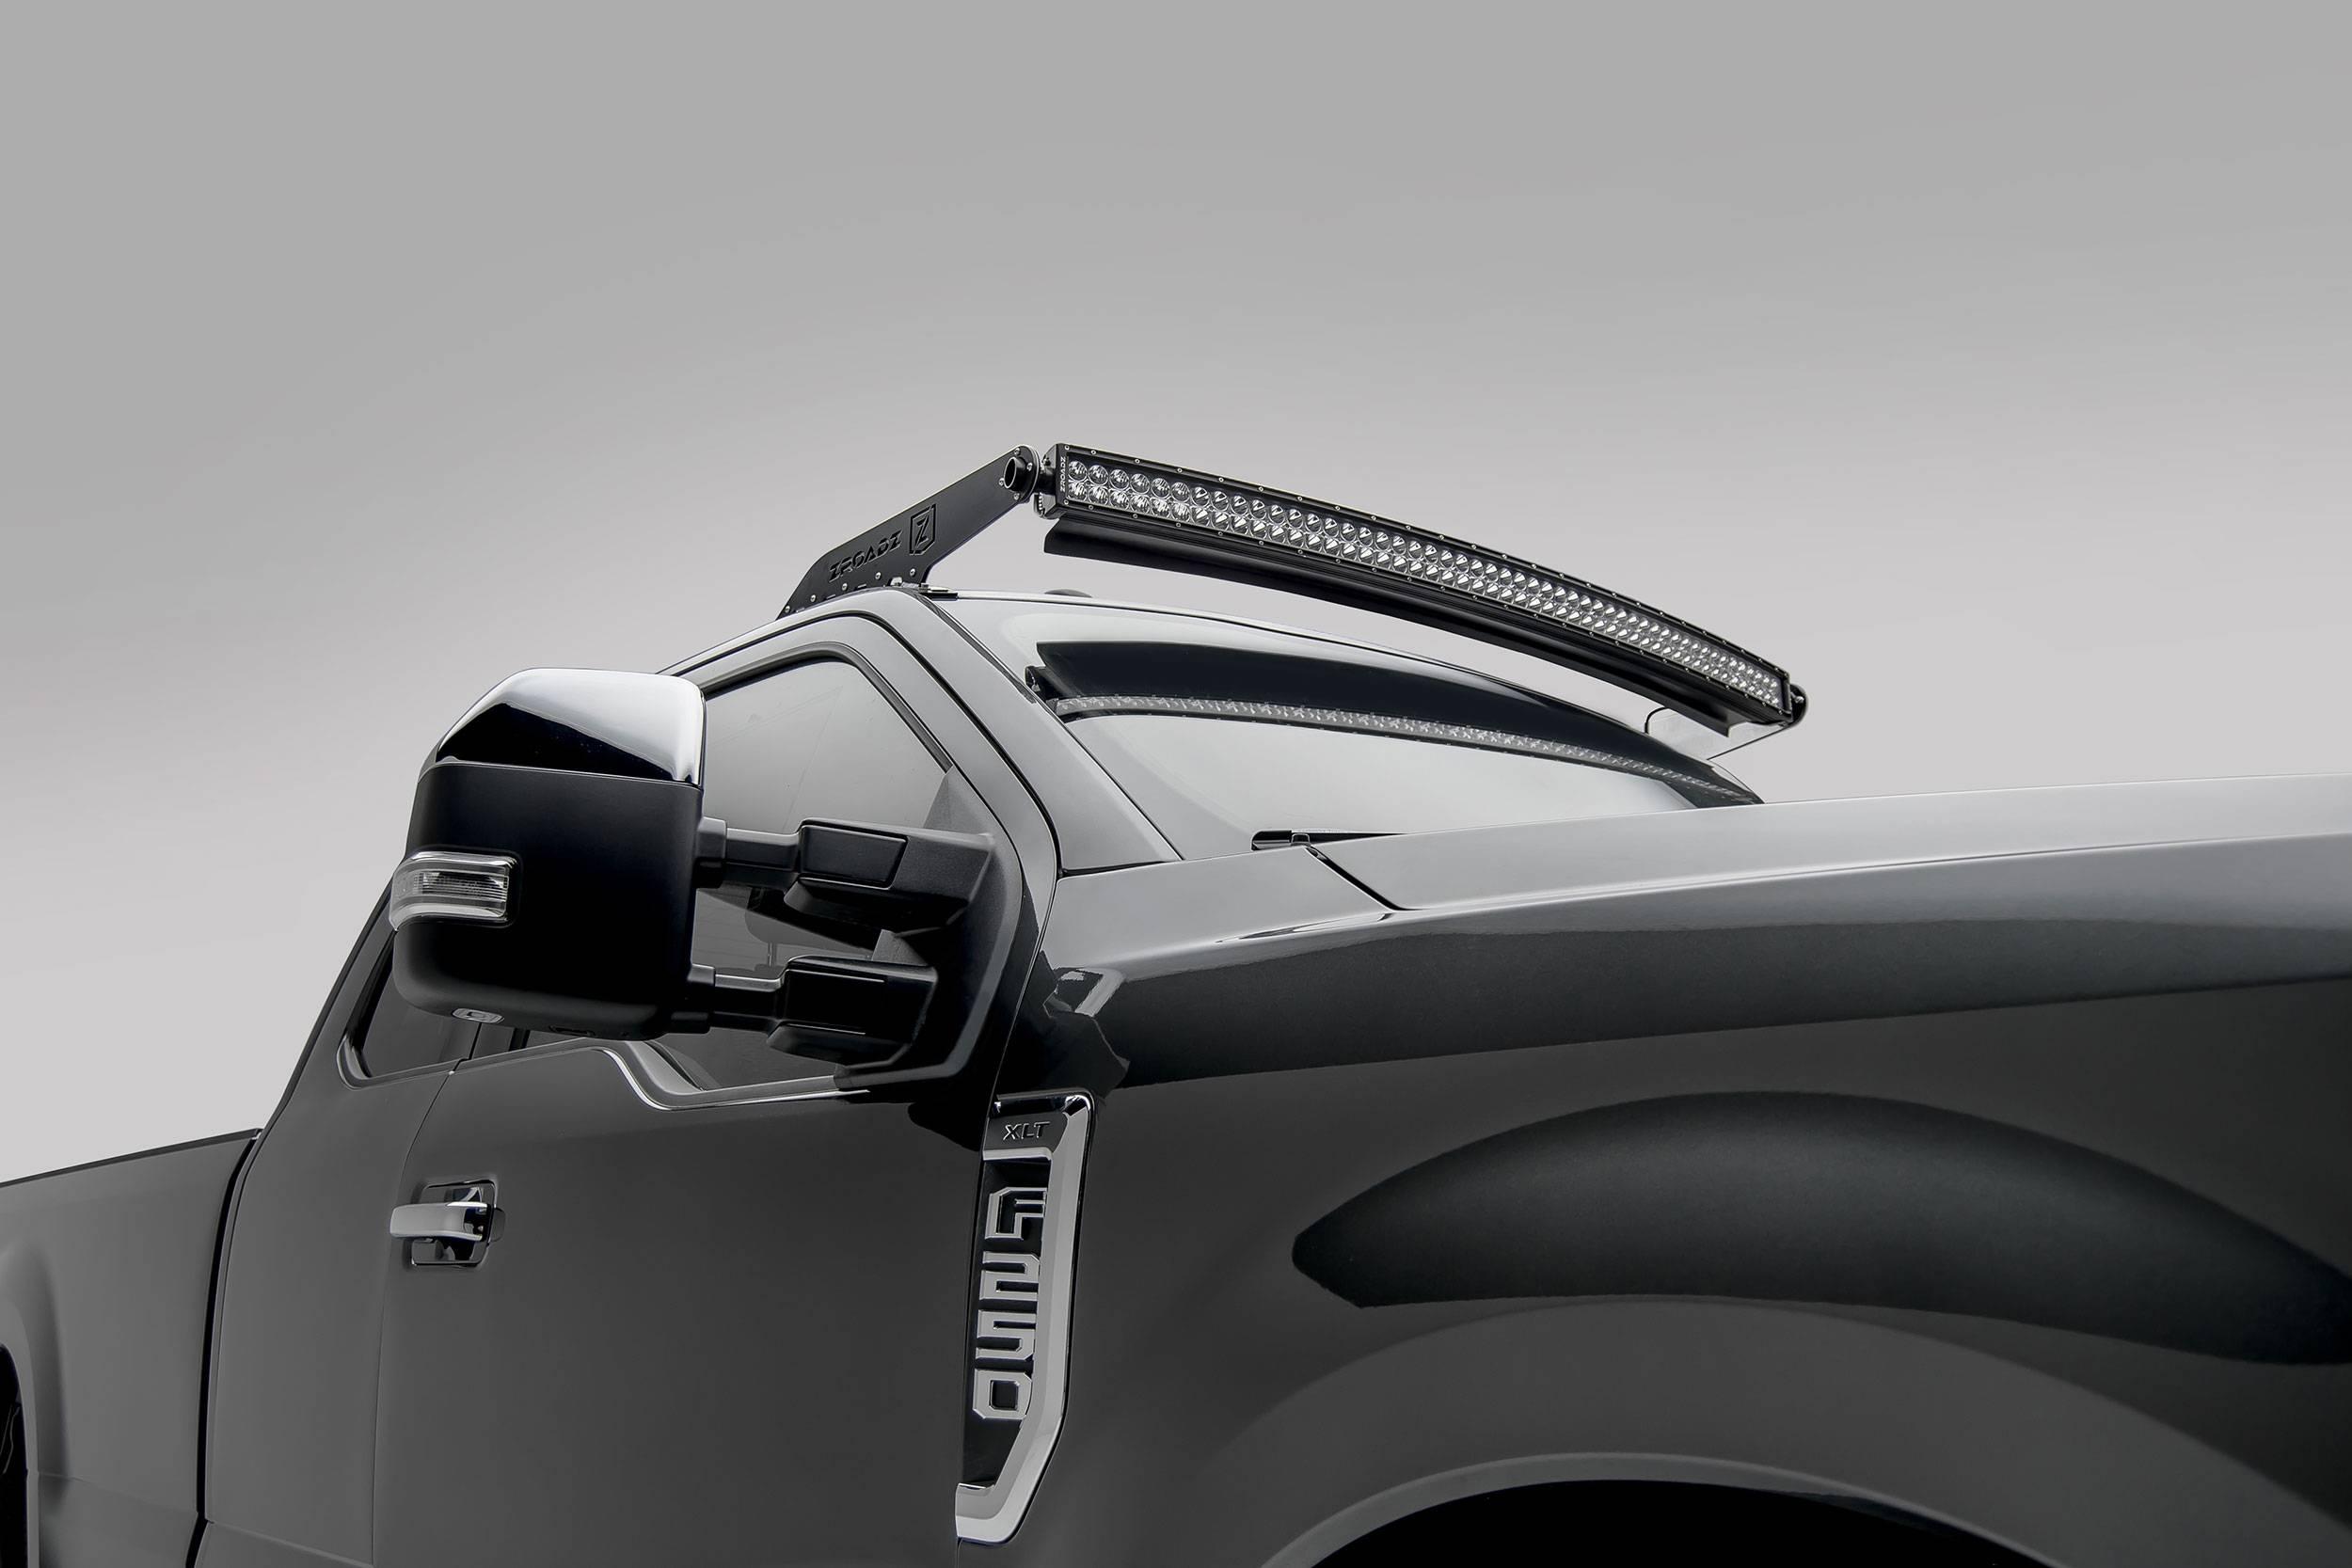 ZROADZ                                             - 2017-2021 Ford Super Duty Front Roof LED Bracket to mount (1) 52 Inch Curved LED Light Bar - PN #Z335471